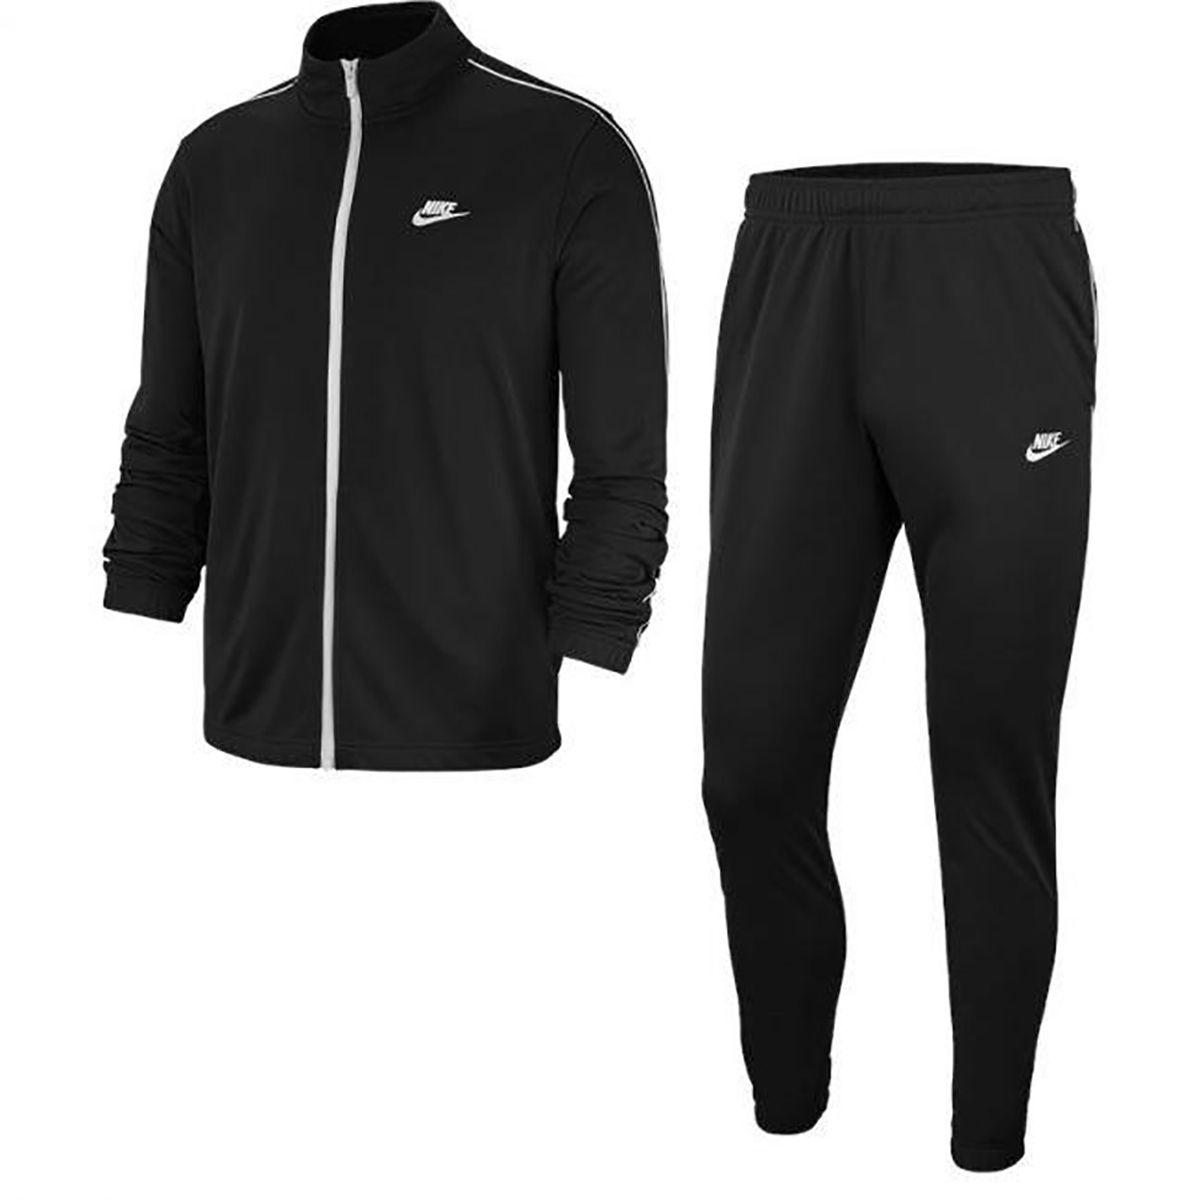 Nike Tuta Poliestere Full Zip Uomo Nero